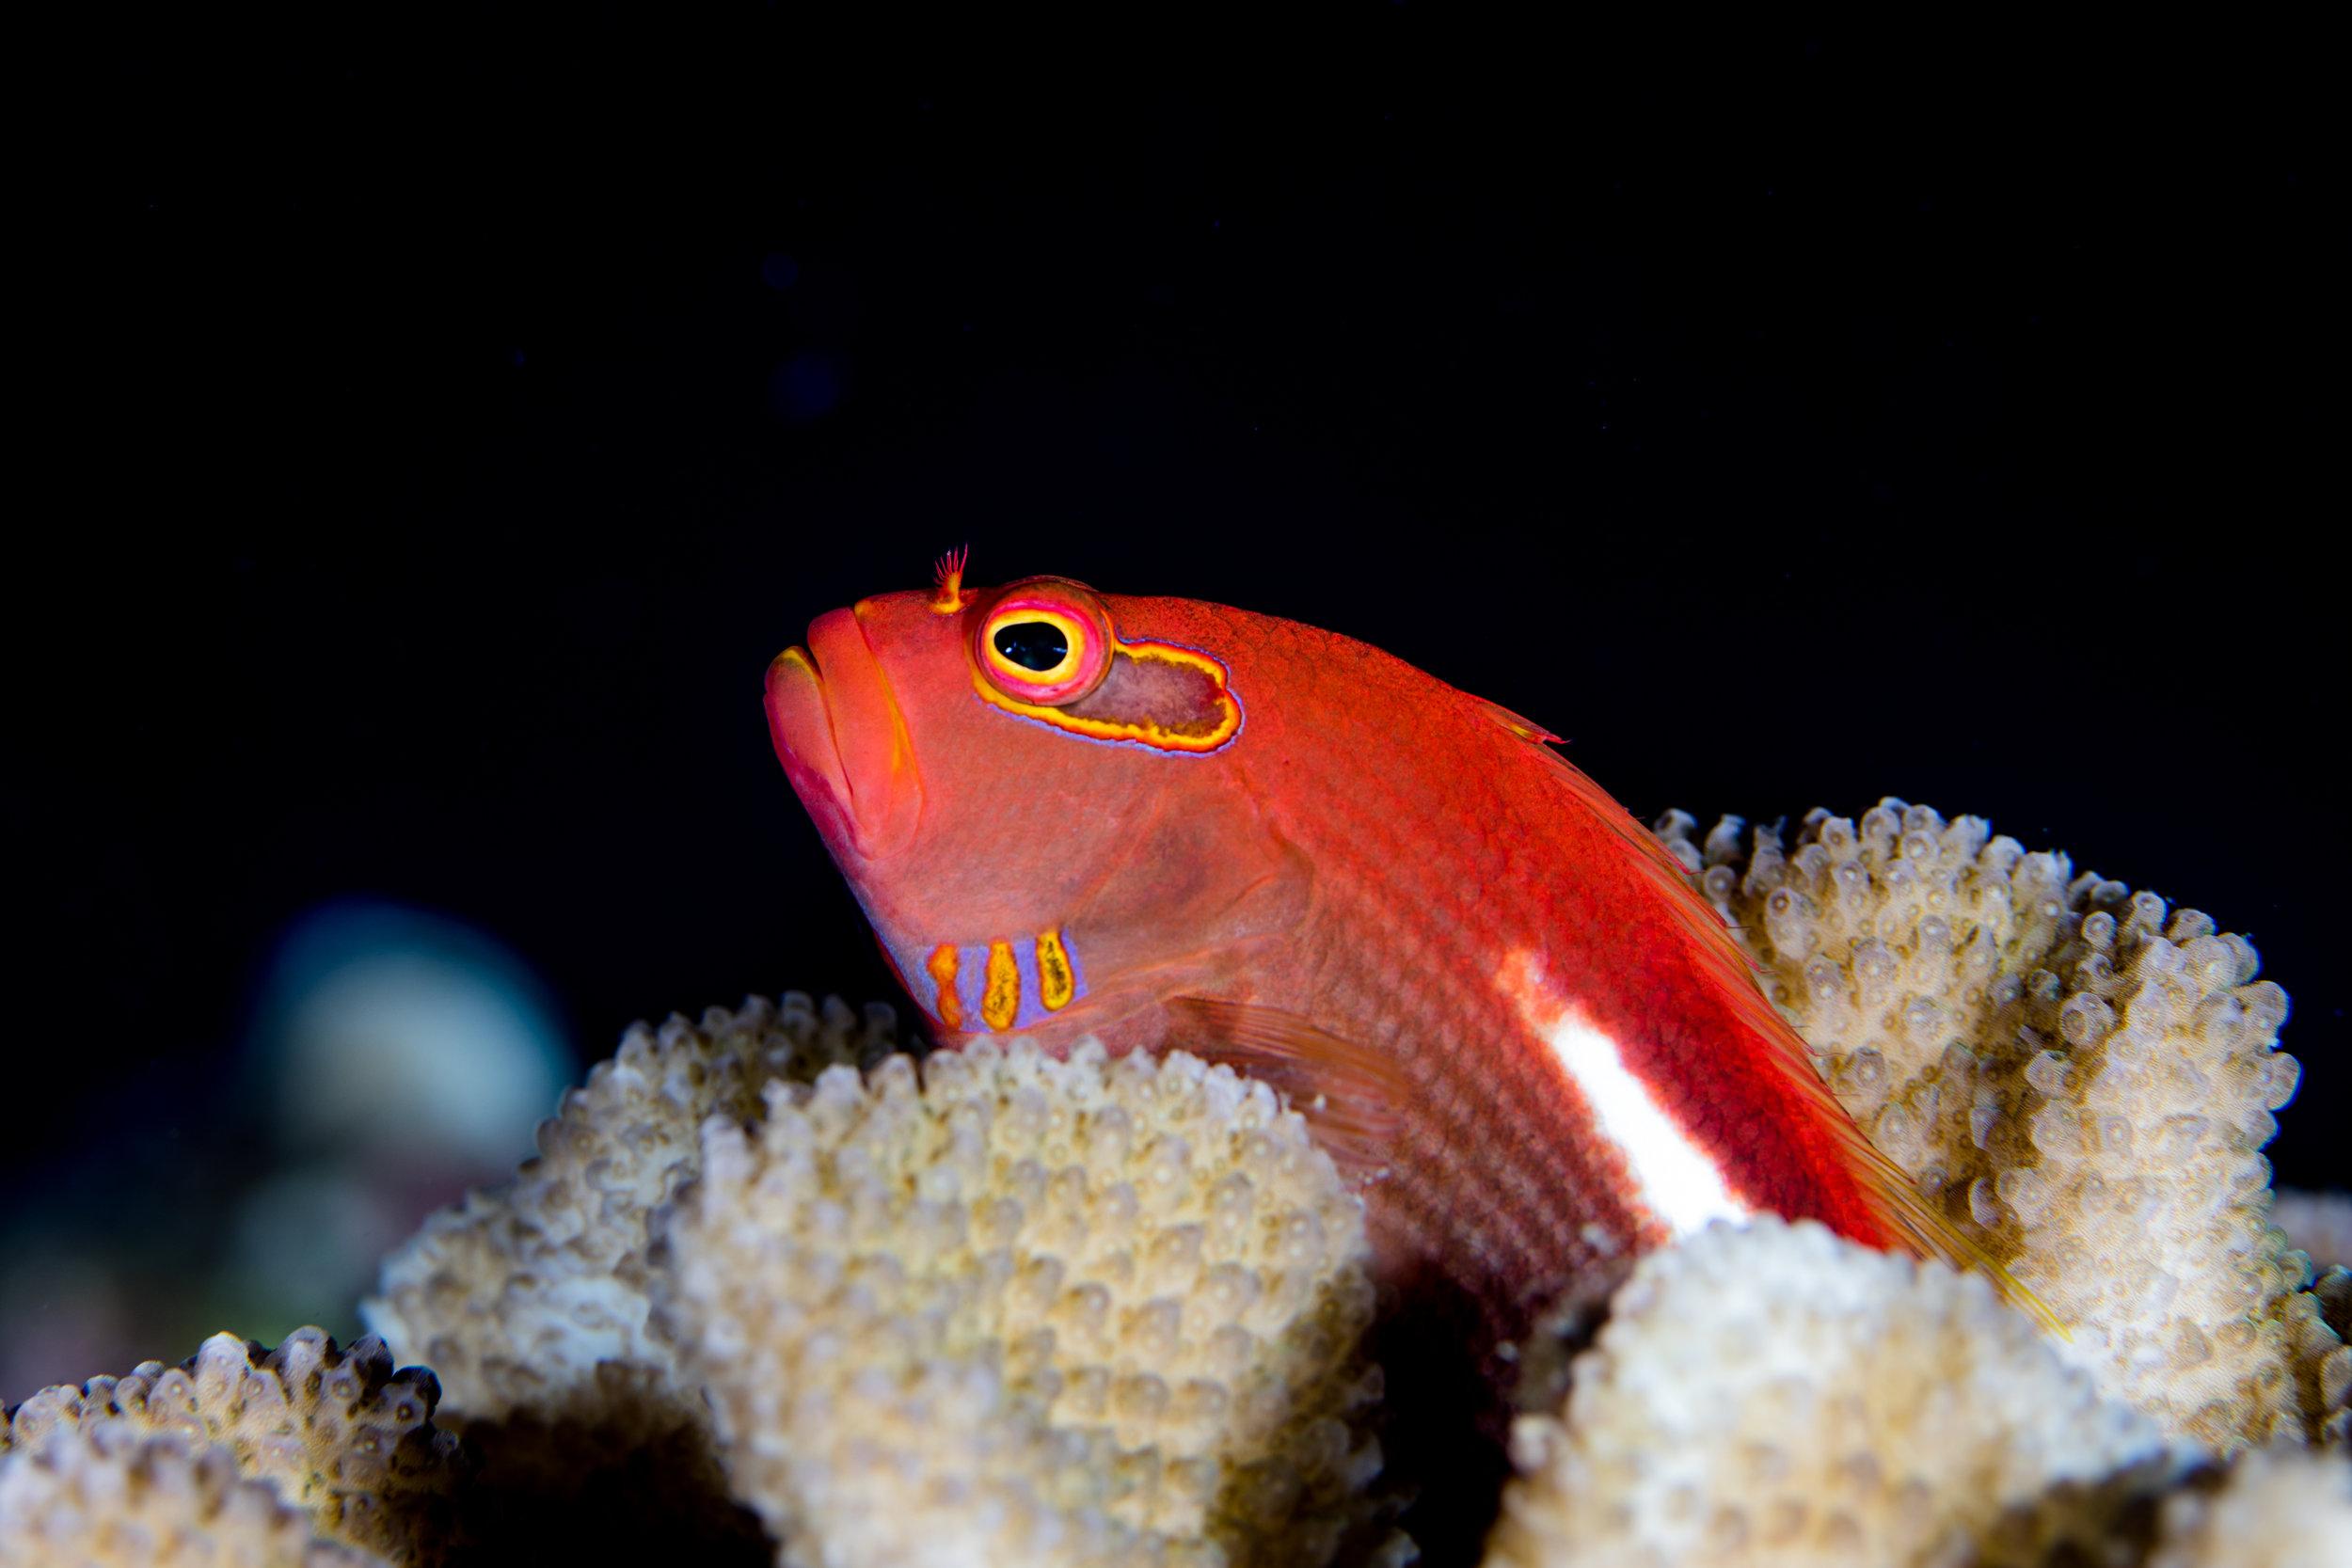 Paracirrhites, hawk fish credit: kimberly jefferies / coral reef image bank